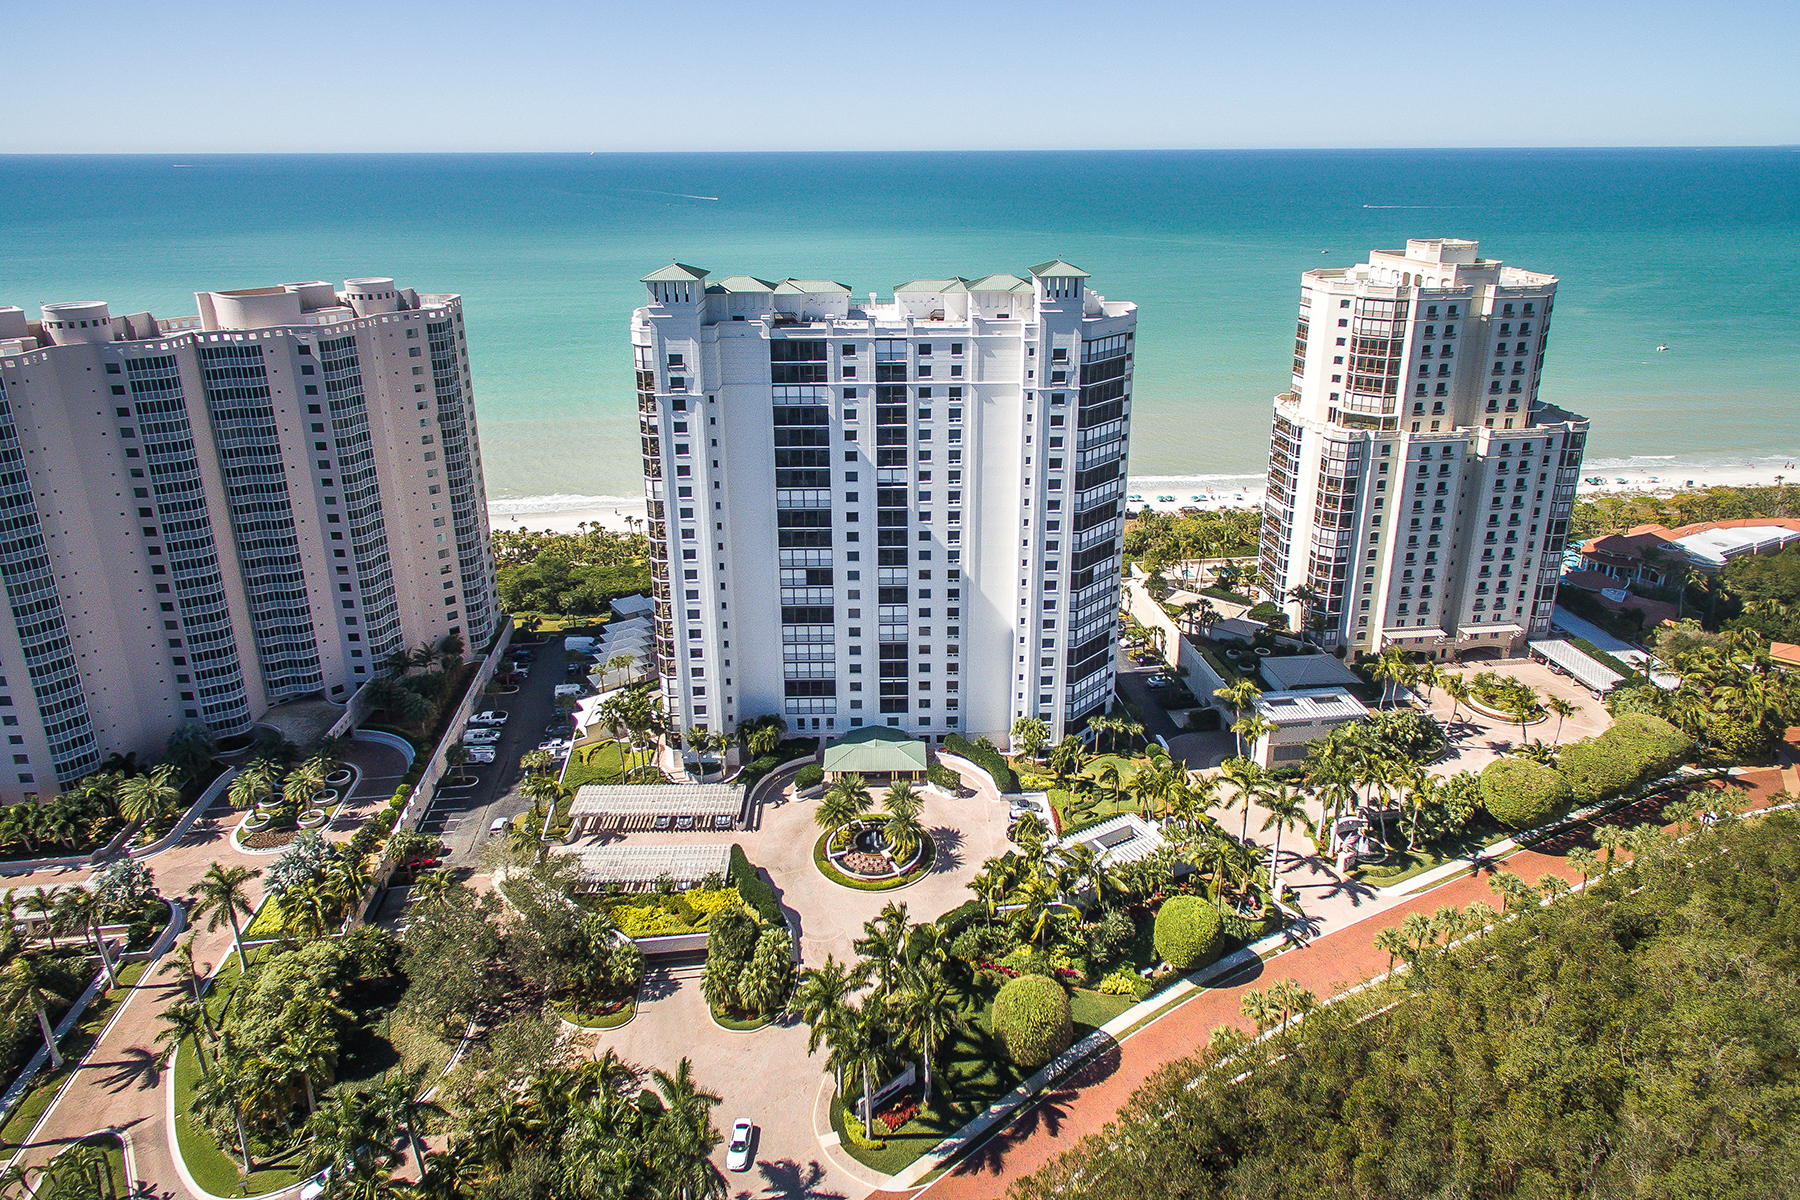 شقة بعمارة للـ Sale في 8473 Bay Colony Drive , Unit 602, Naples, FL 34108 8473 Bay Colony Dr 602, Pelican Bay, Naples, Florida, 34108 United States